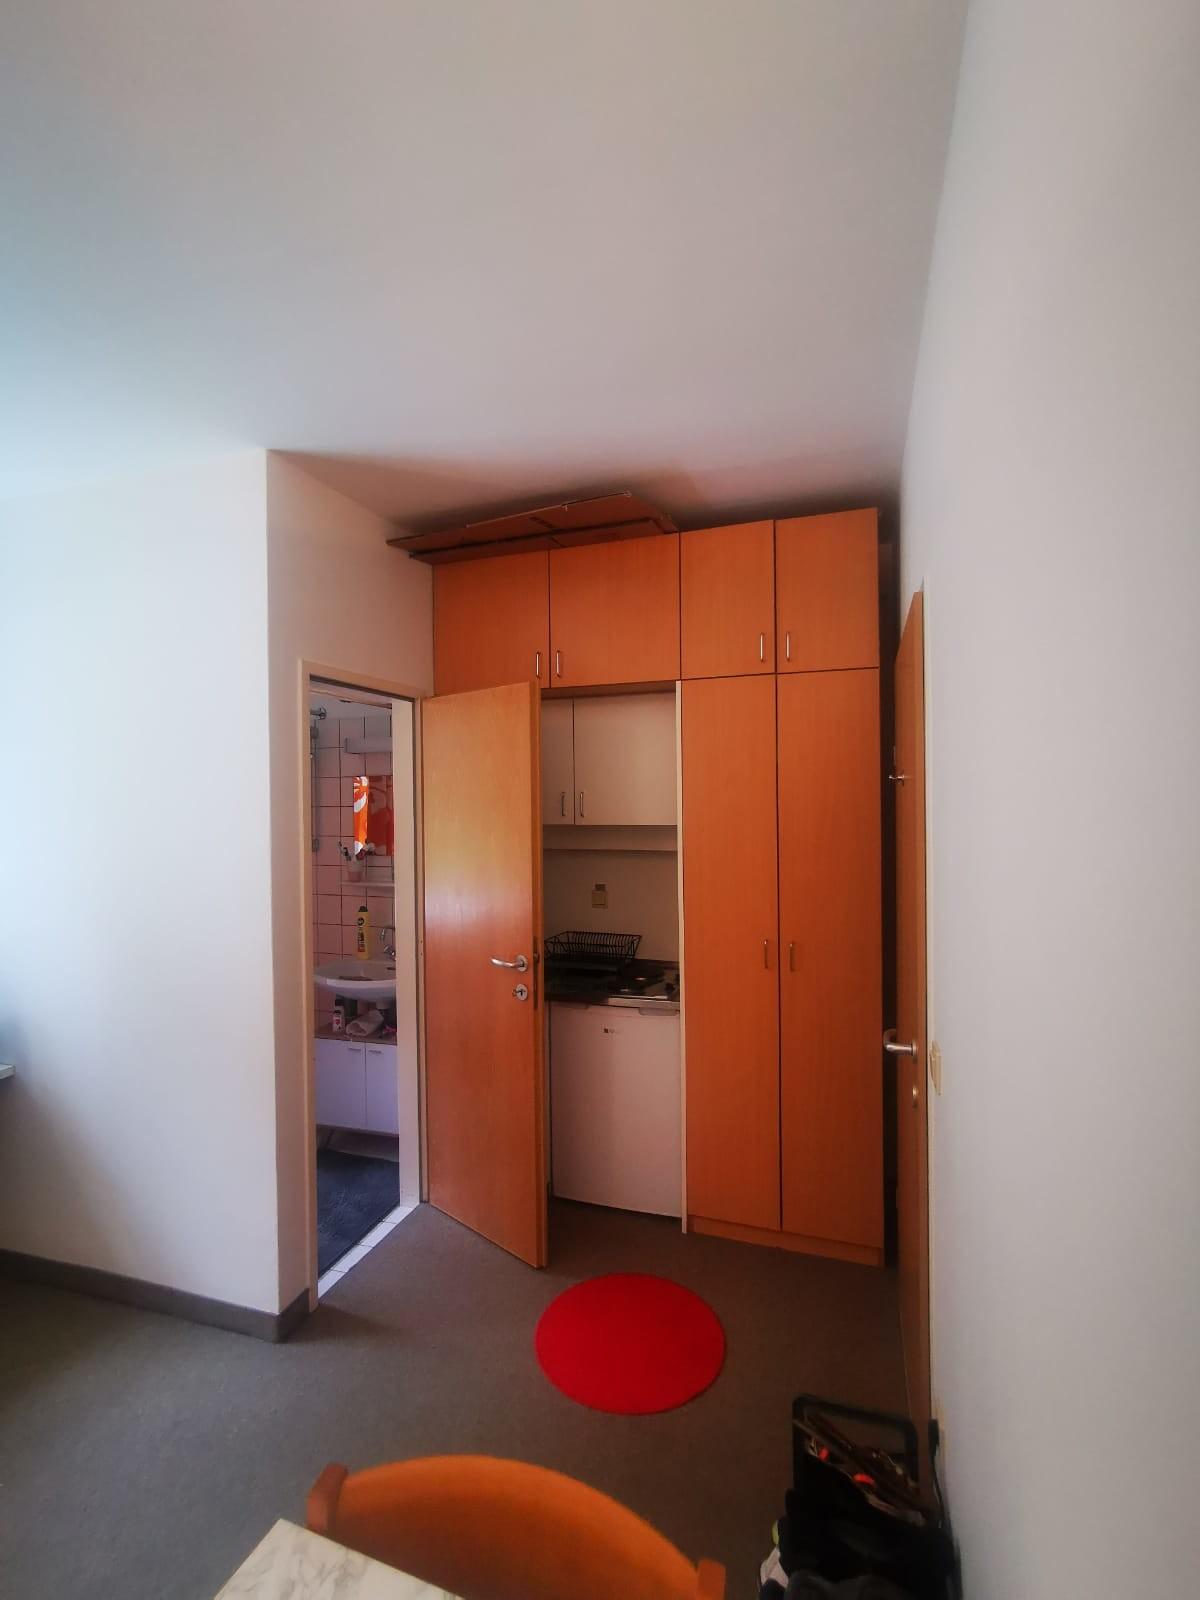 Voglau,  94032 Passau